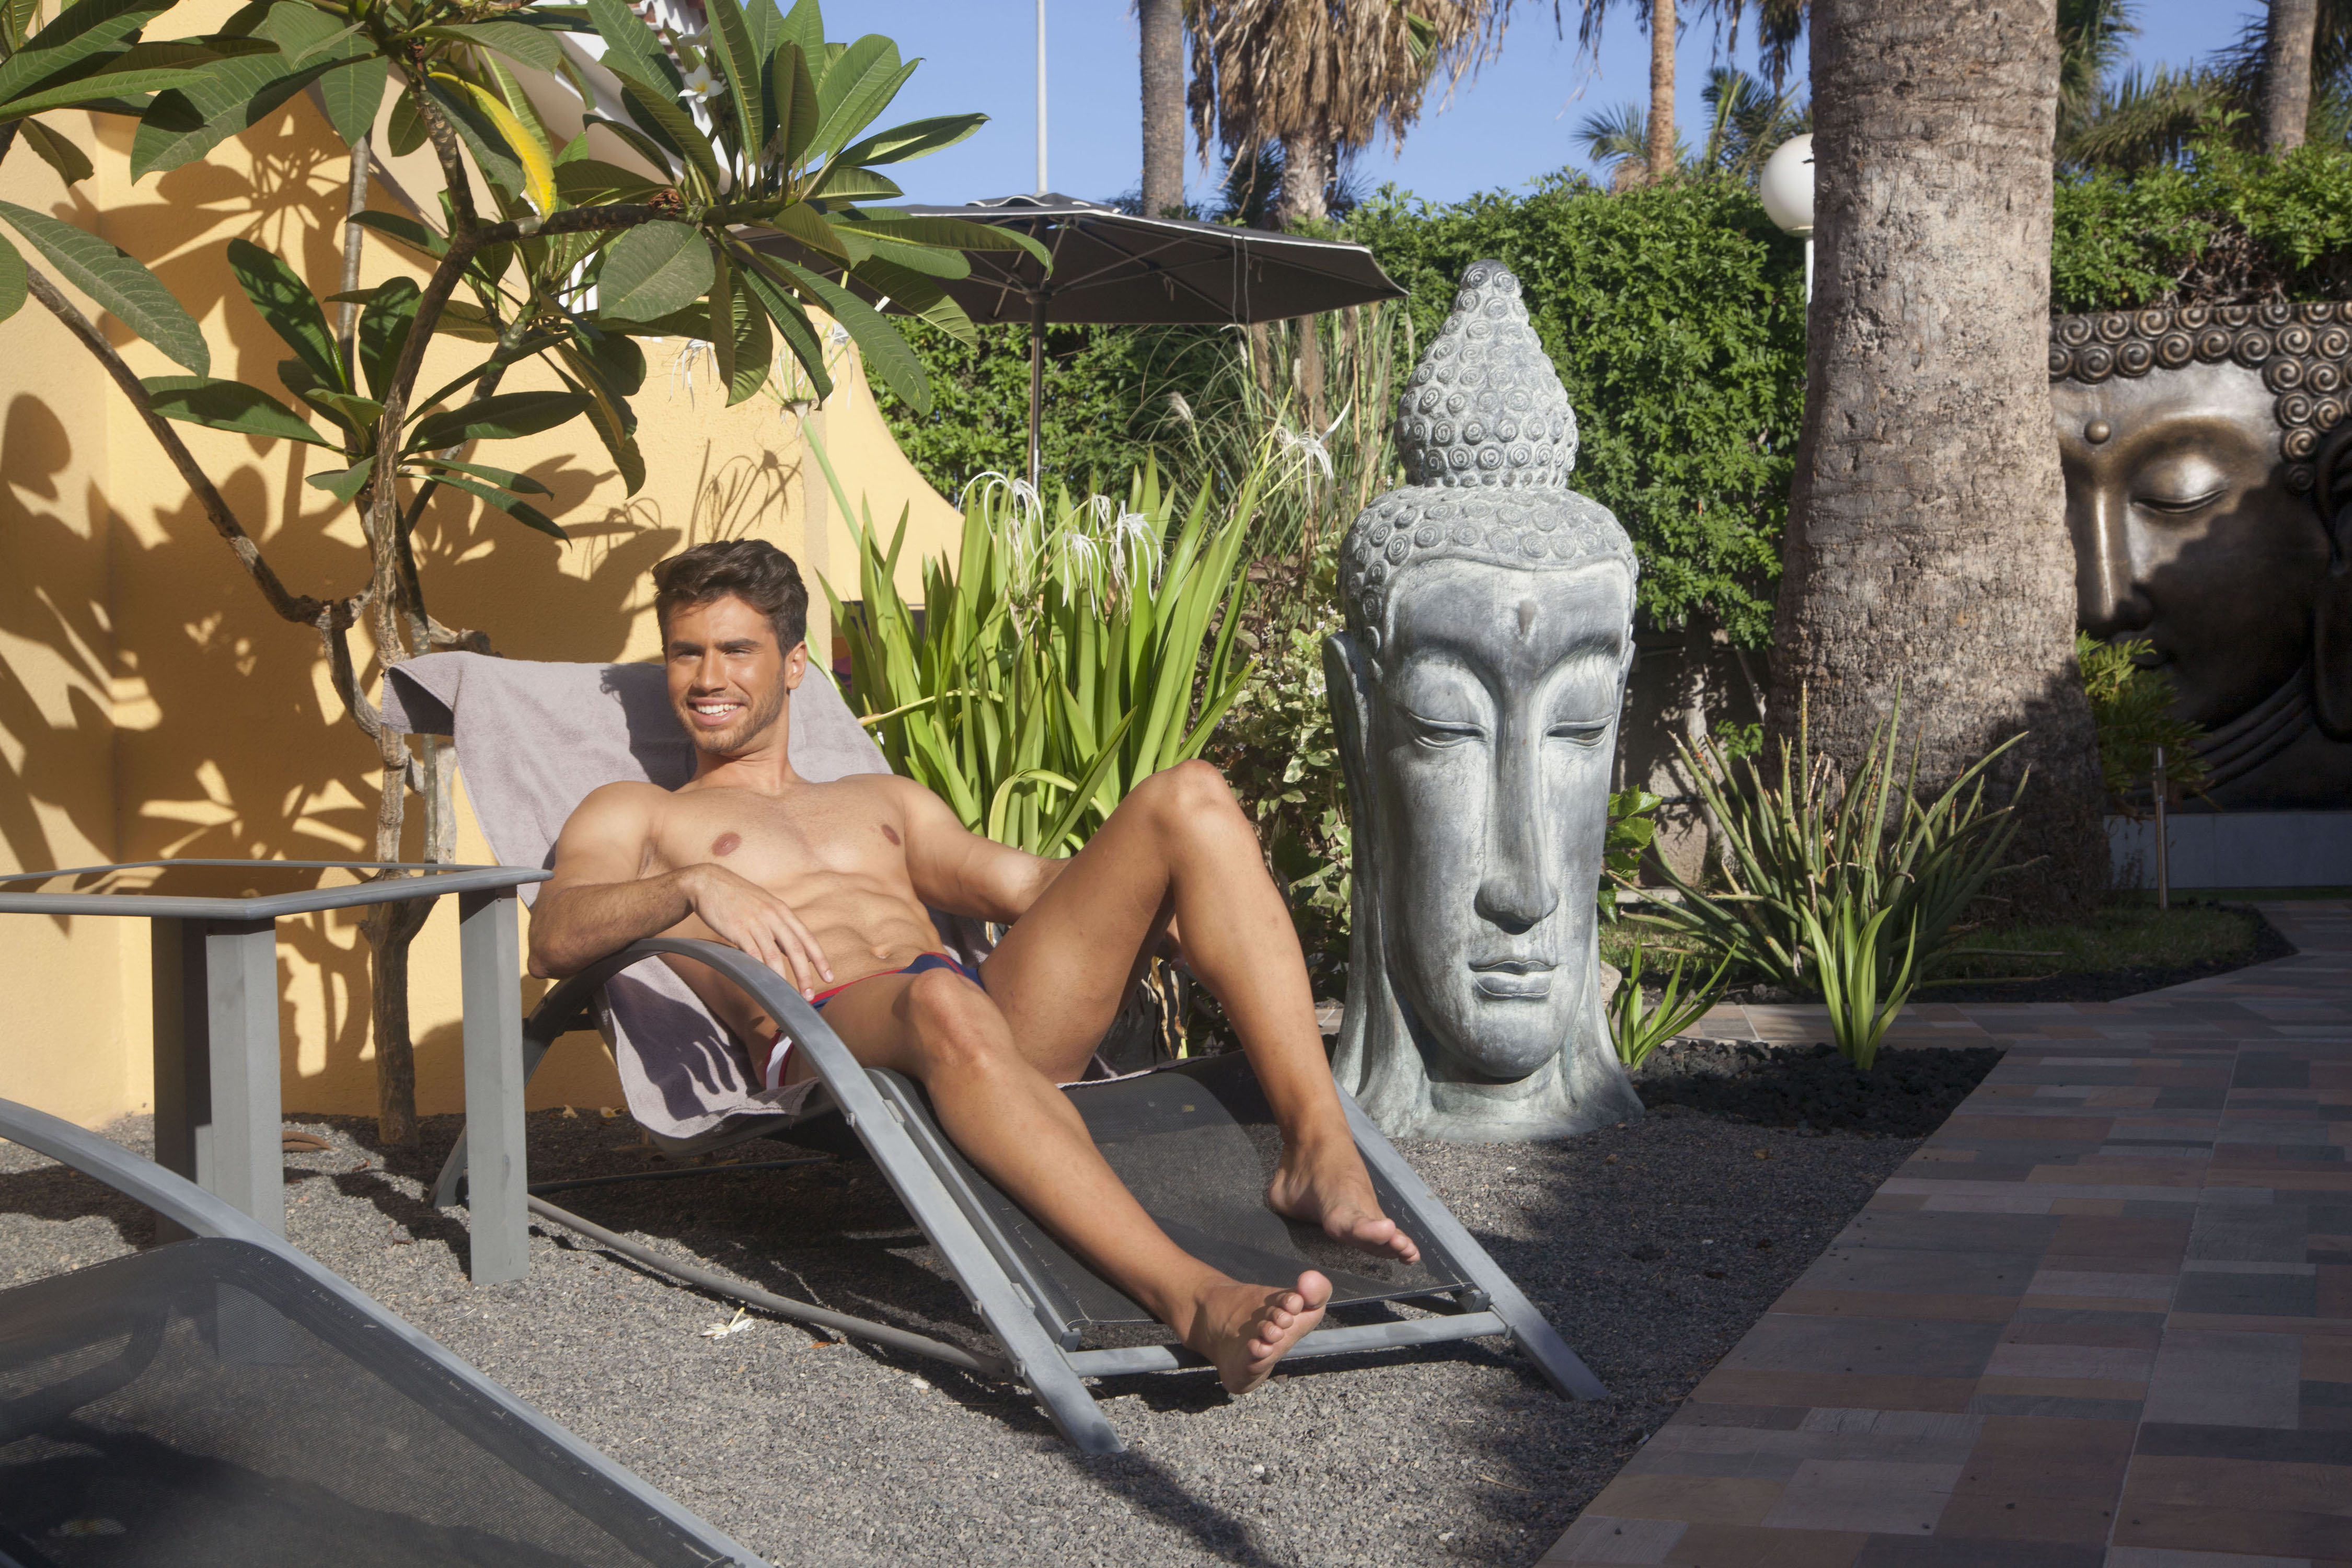 Gay Resort Hotel Club torso Gran Canaria buitenplaats zitplek